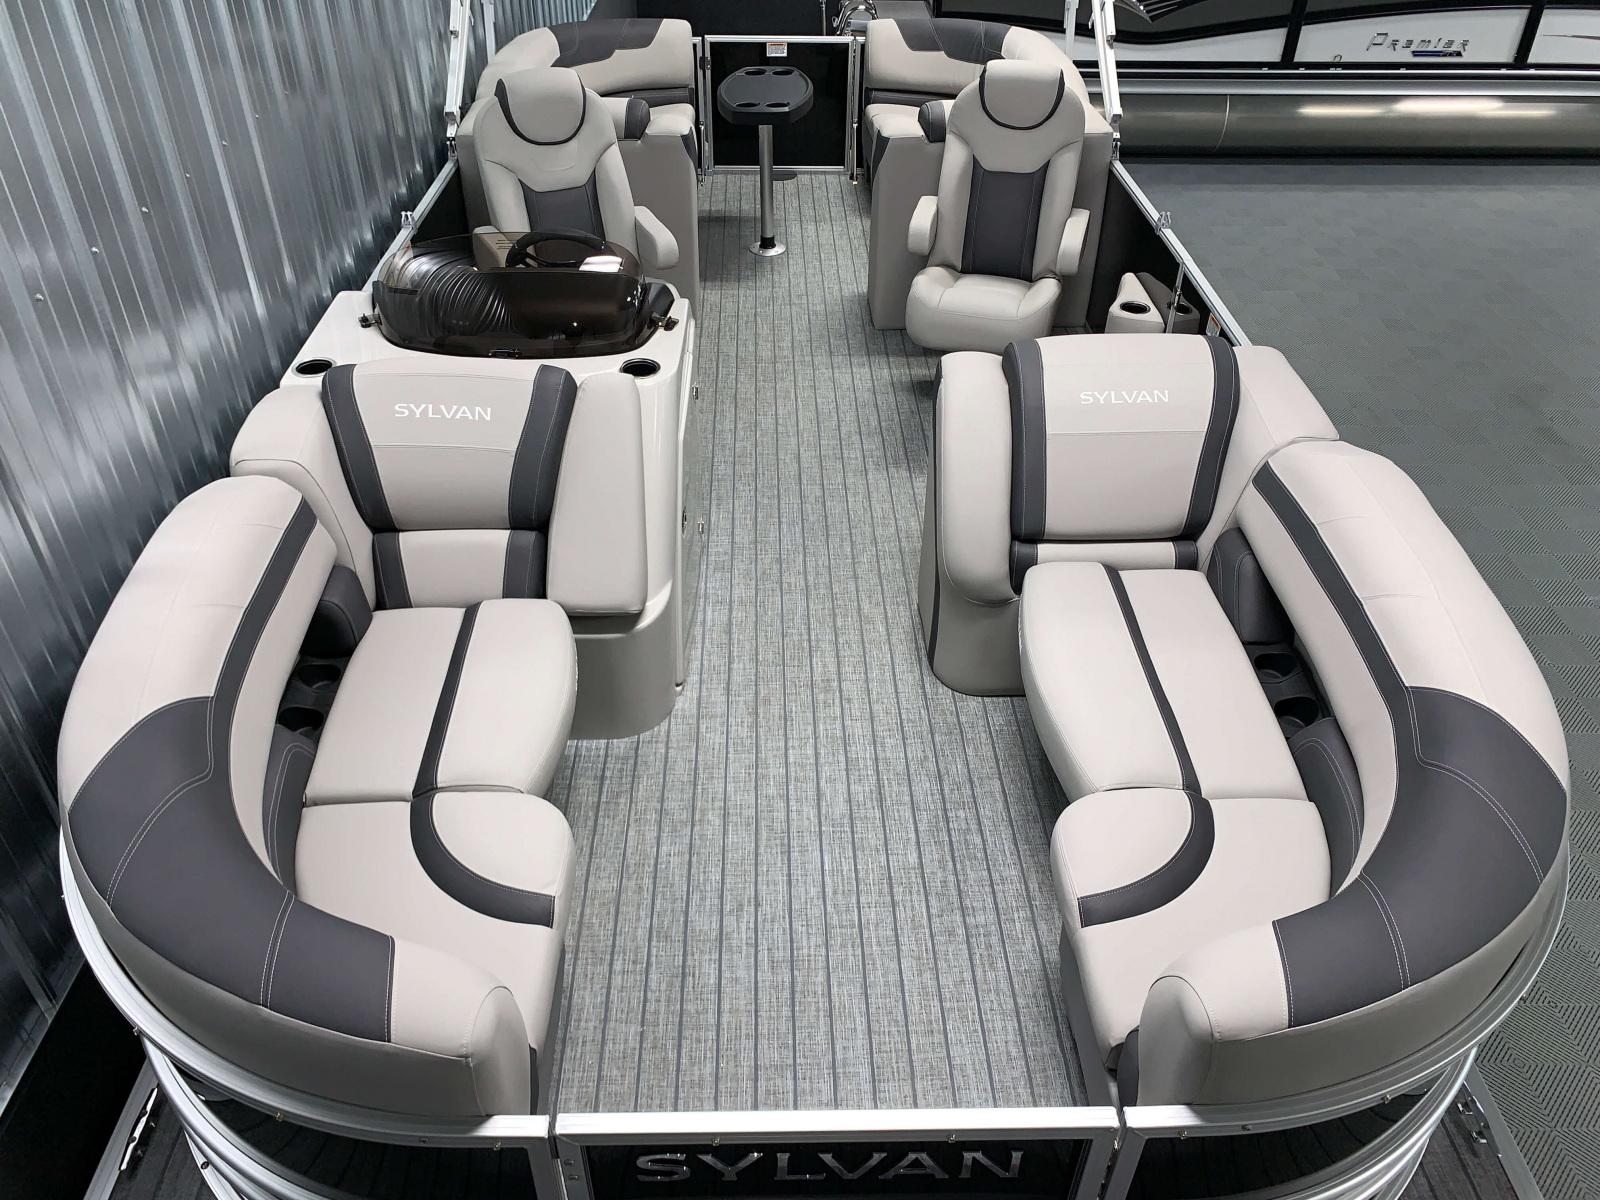 Interior Layout of the 2022 Sylvan L3 LZ Pontoon Boat